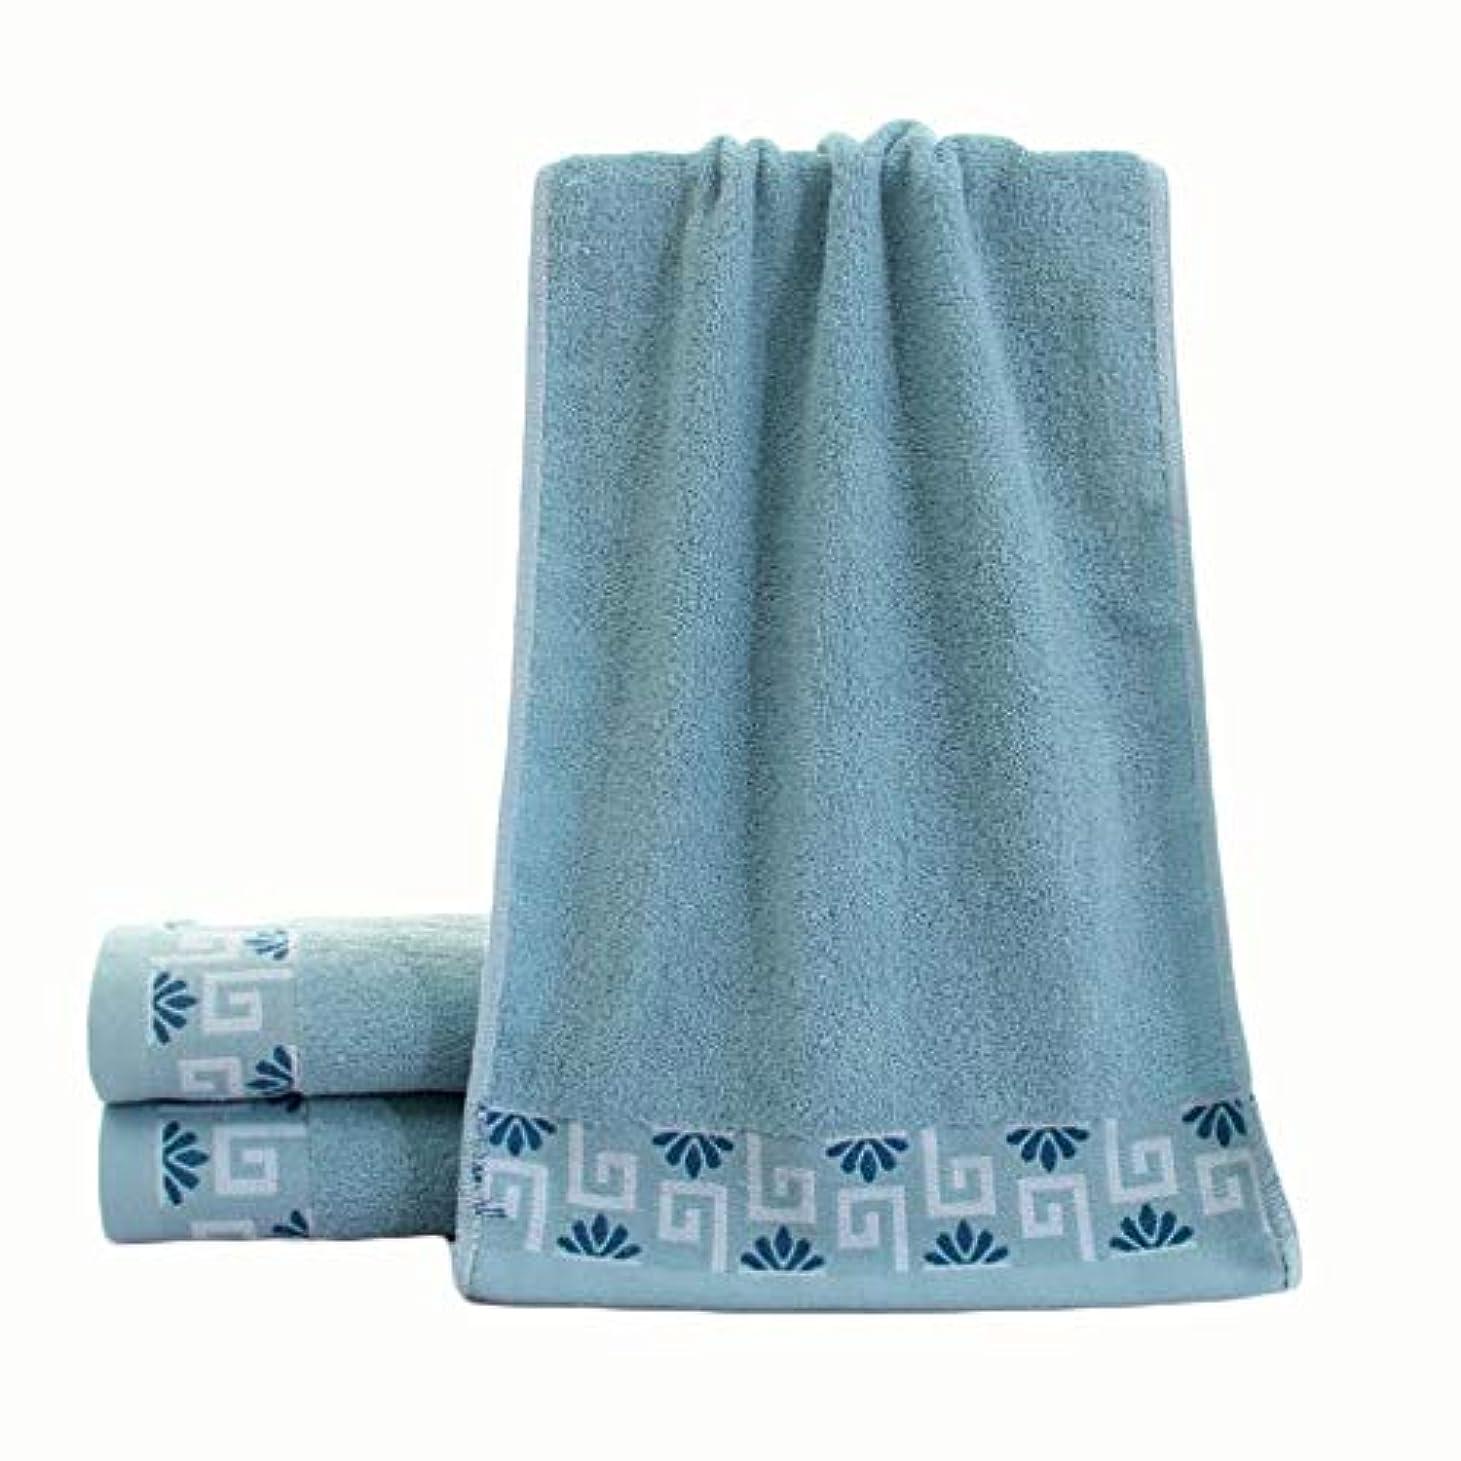 CXUNKK 2PCS / LOT家庭用綿肥厚ソフトタオル (Color : Blue)